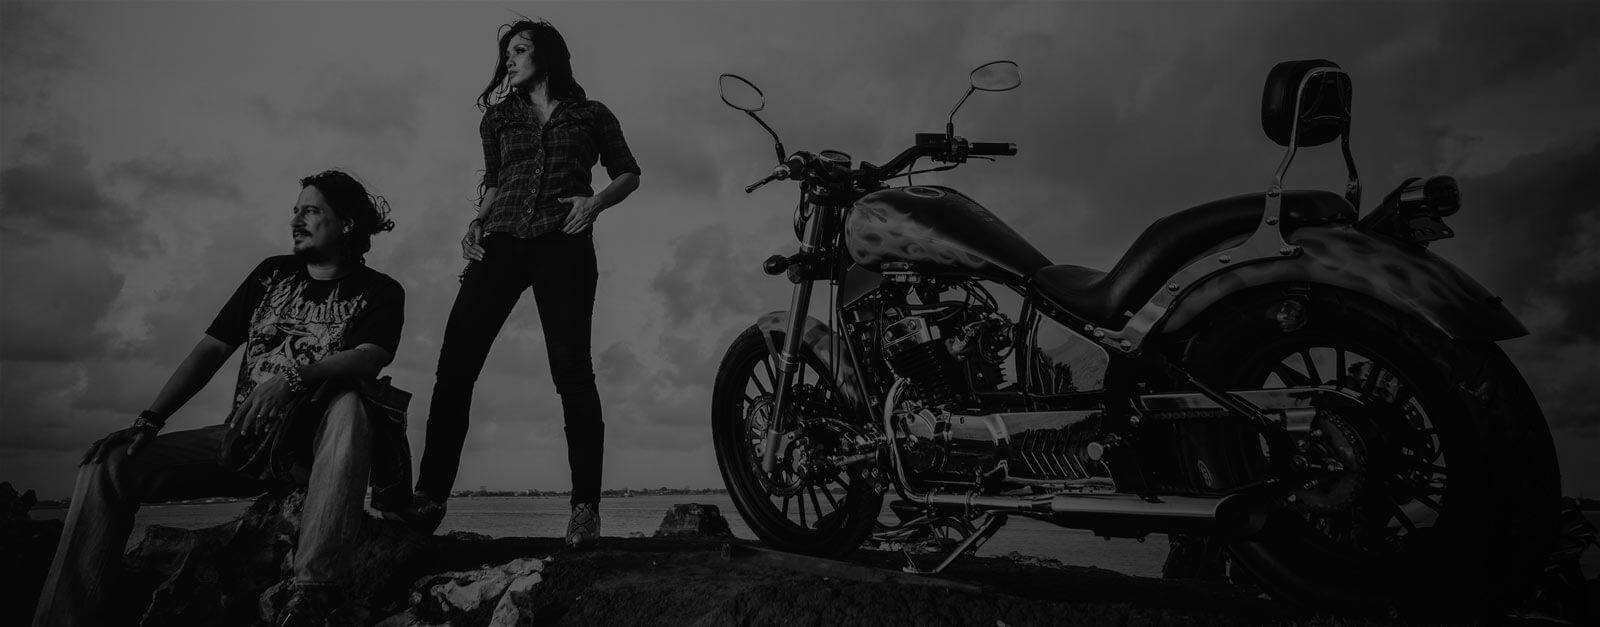 Diablo by Hunter Motorcycles